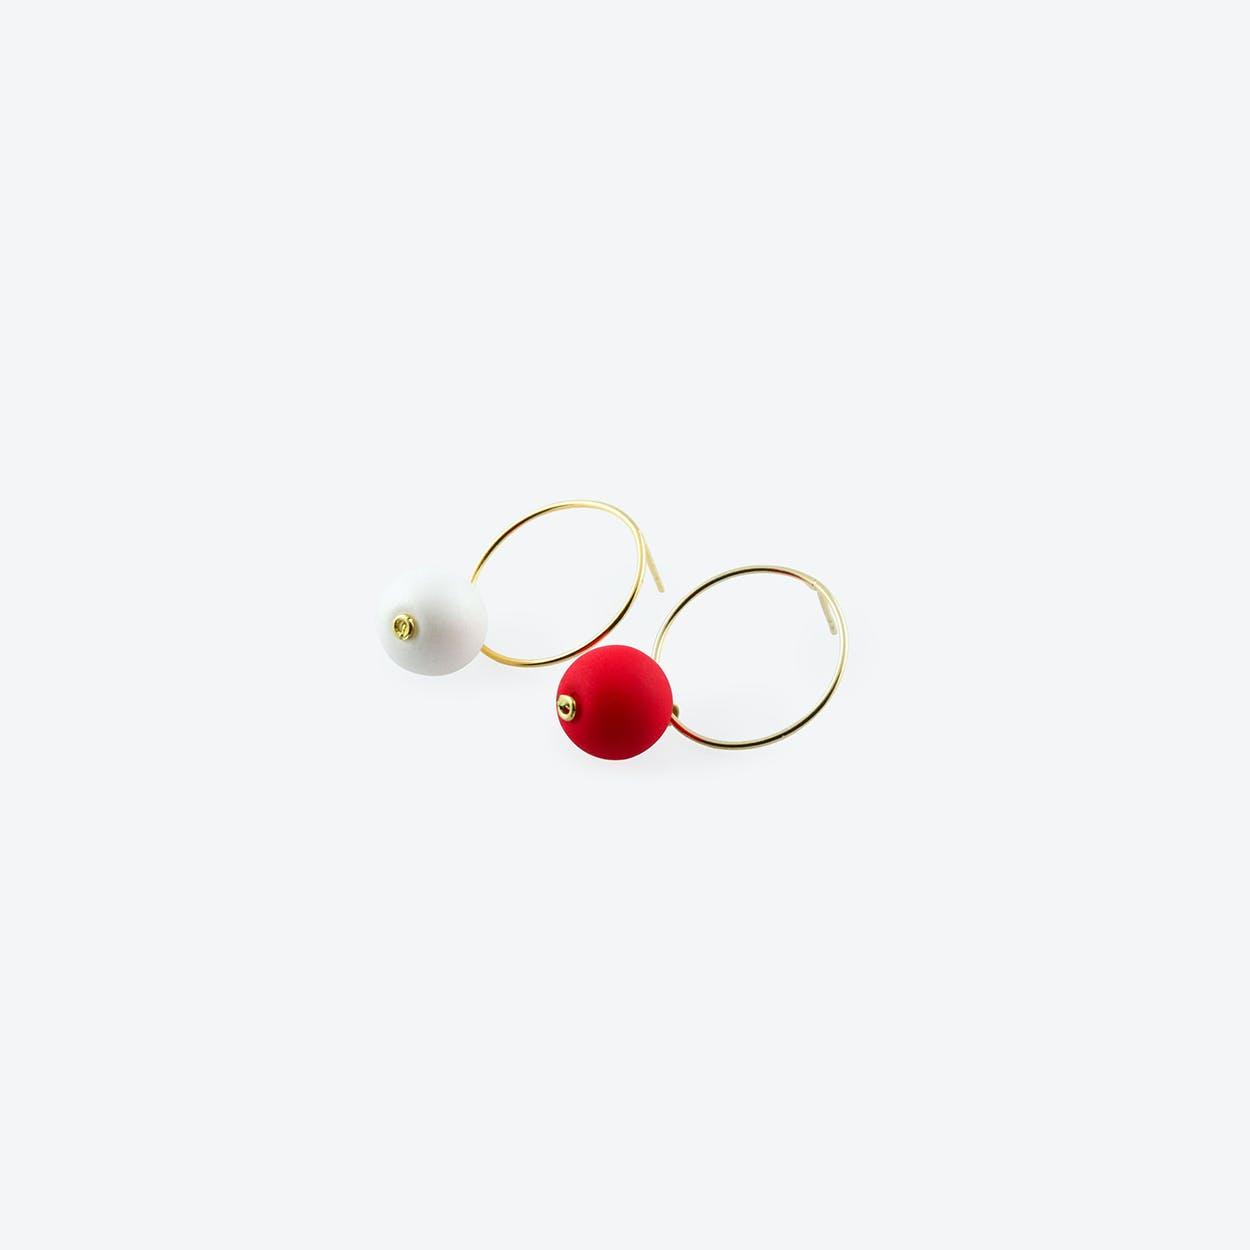 Bombon Earrings in Red & White